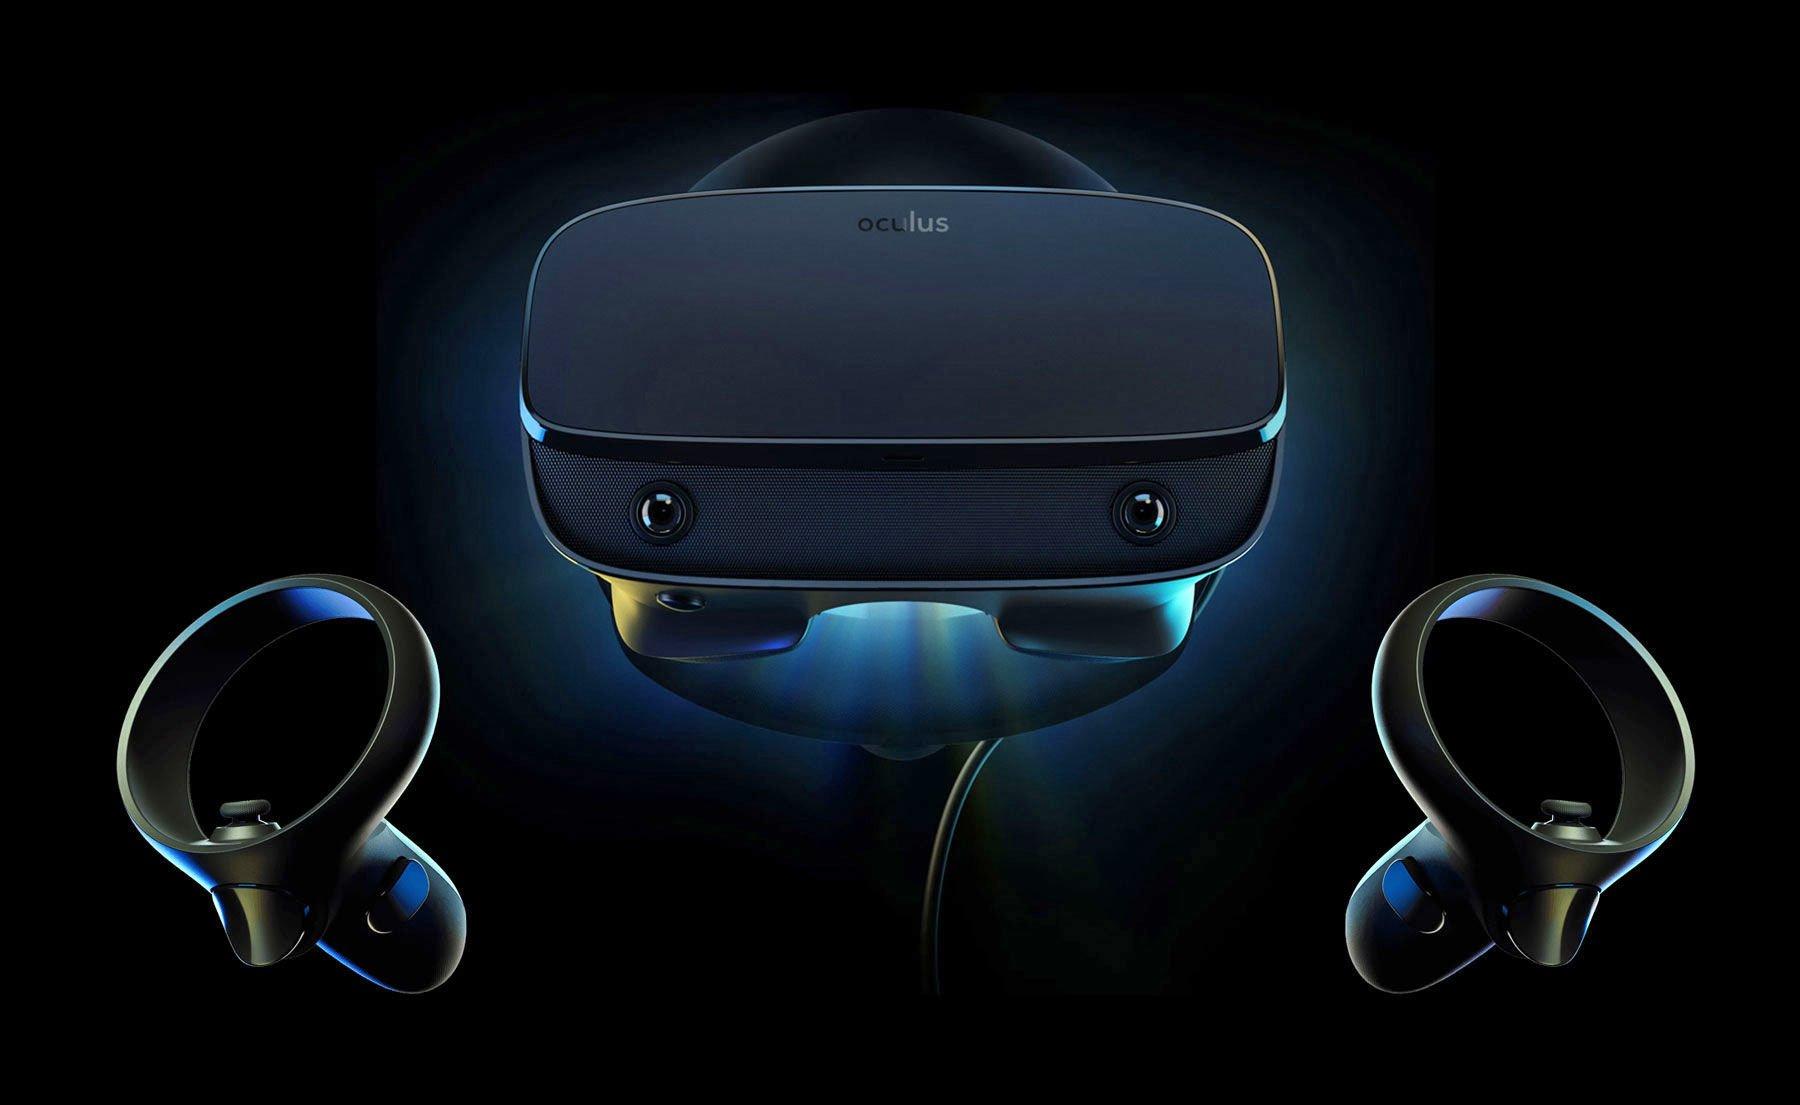 Oculus Rift S PC VR HMD hands-on impressions at GDC 2019 ...